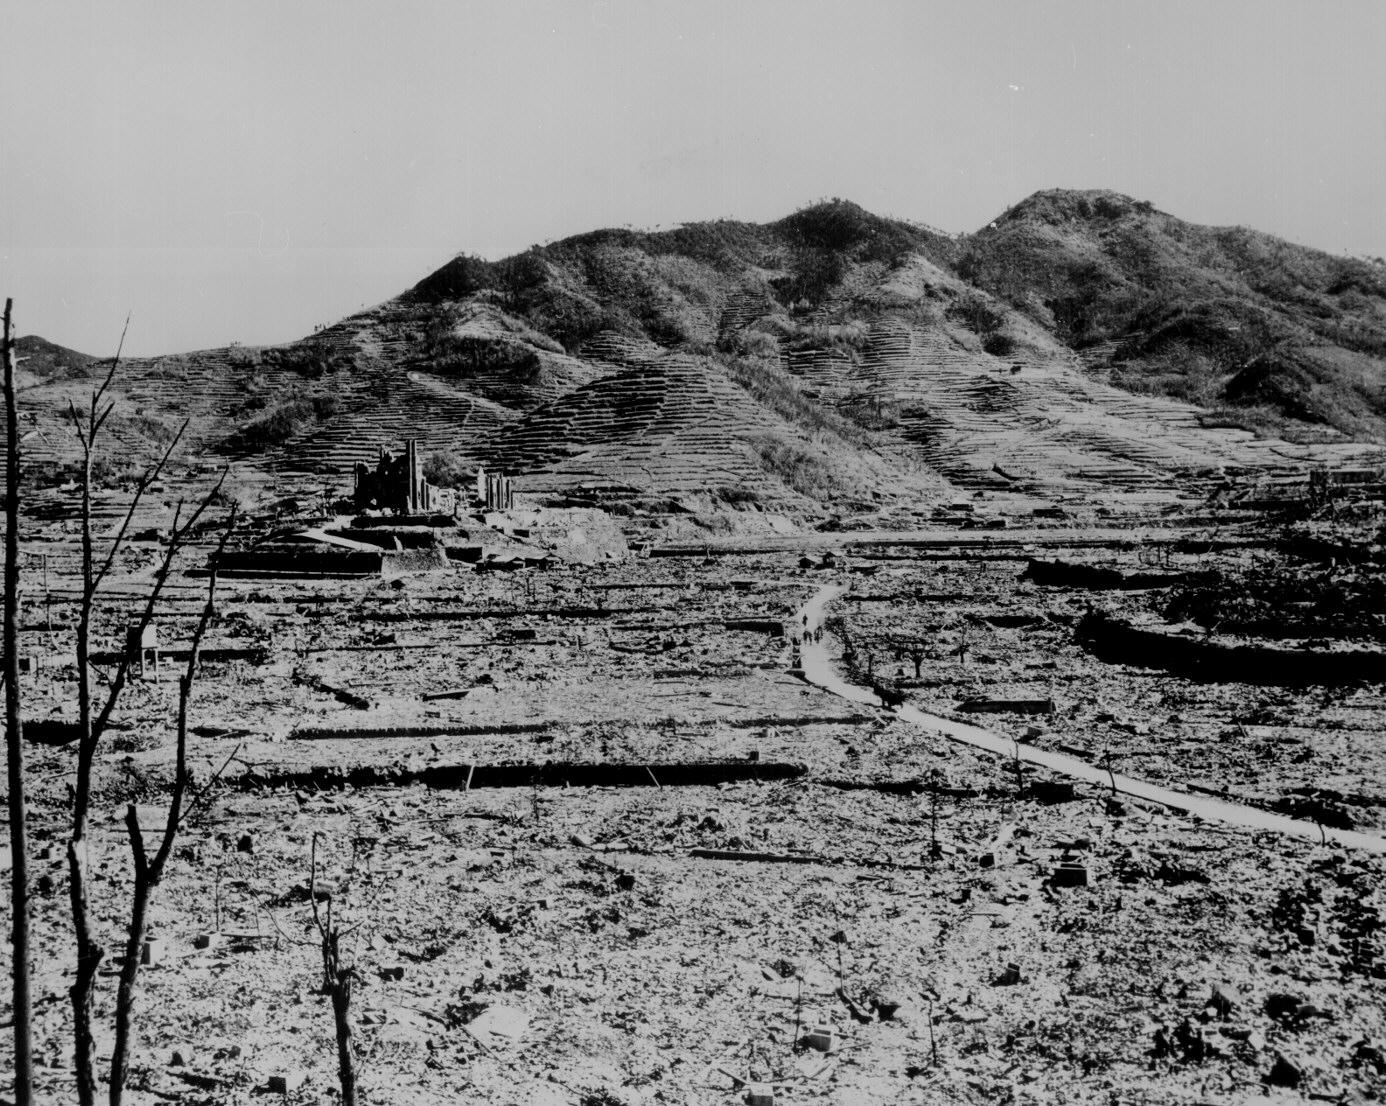 Bombing of Hiroshima and Nagasaki